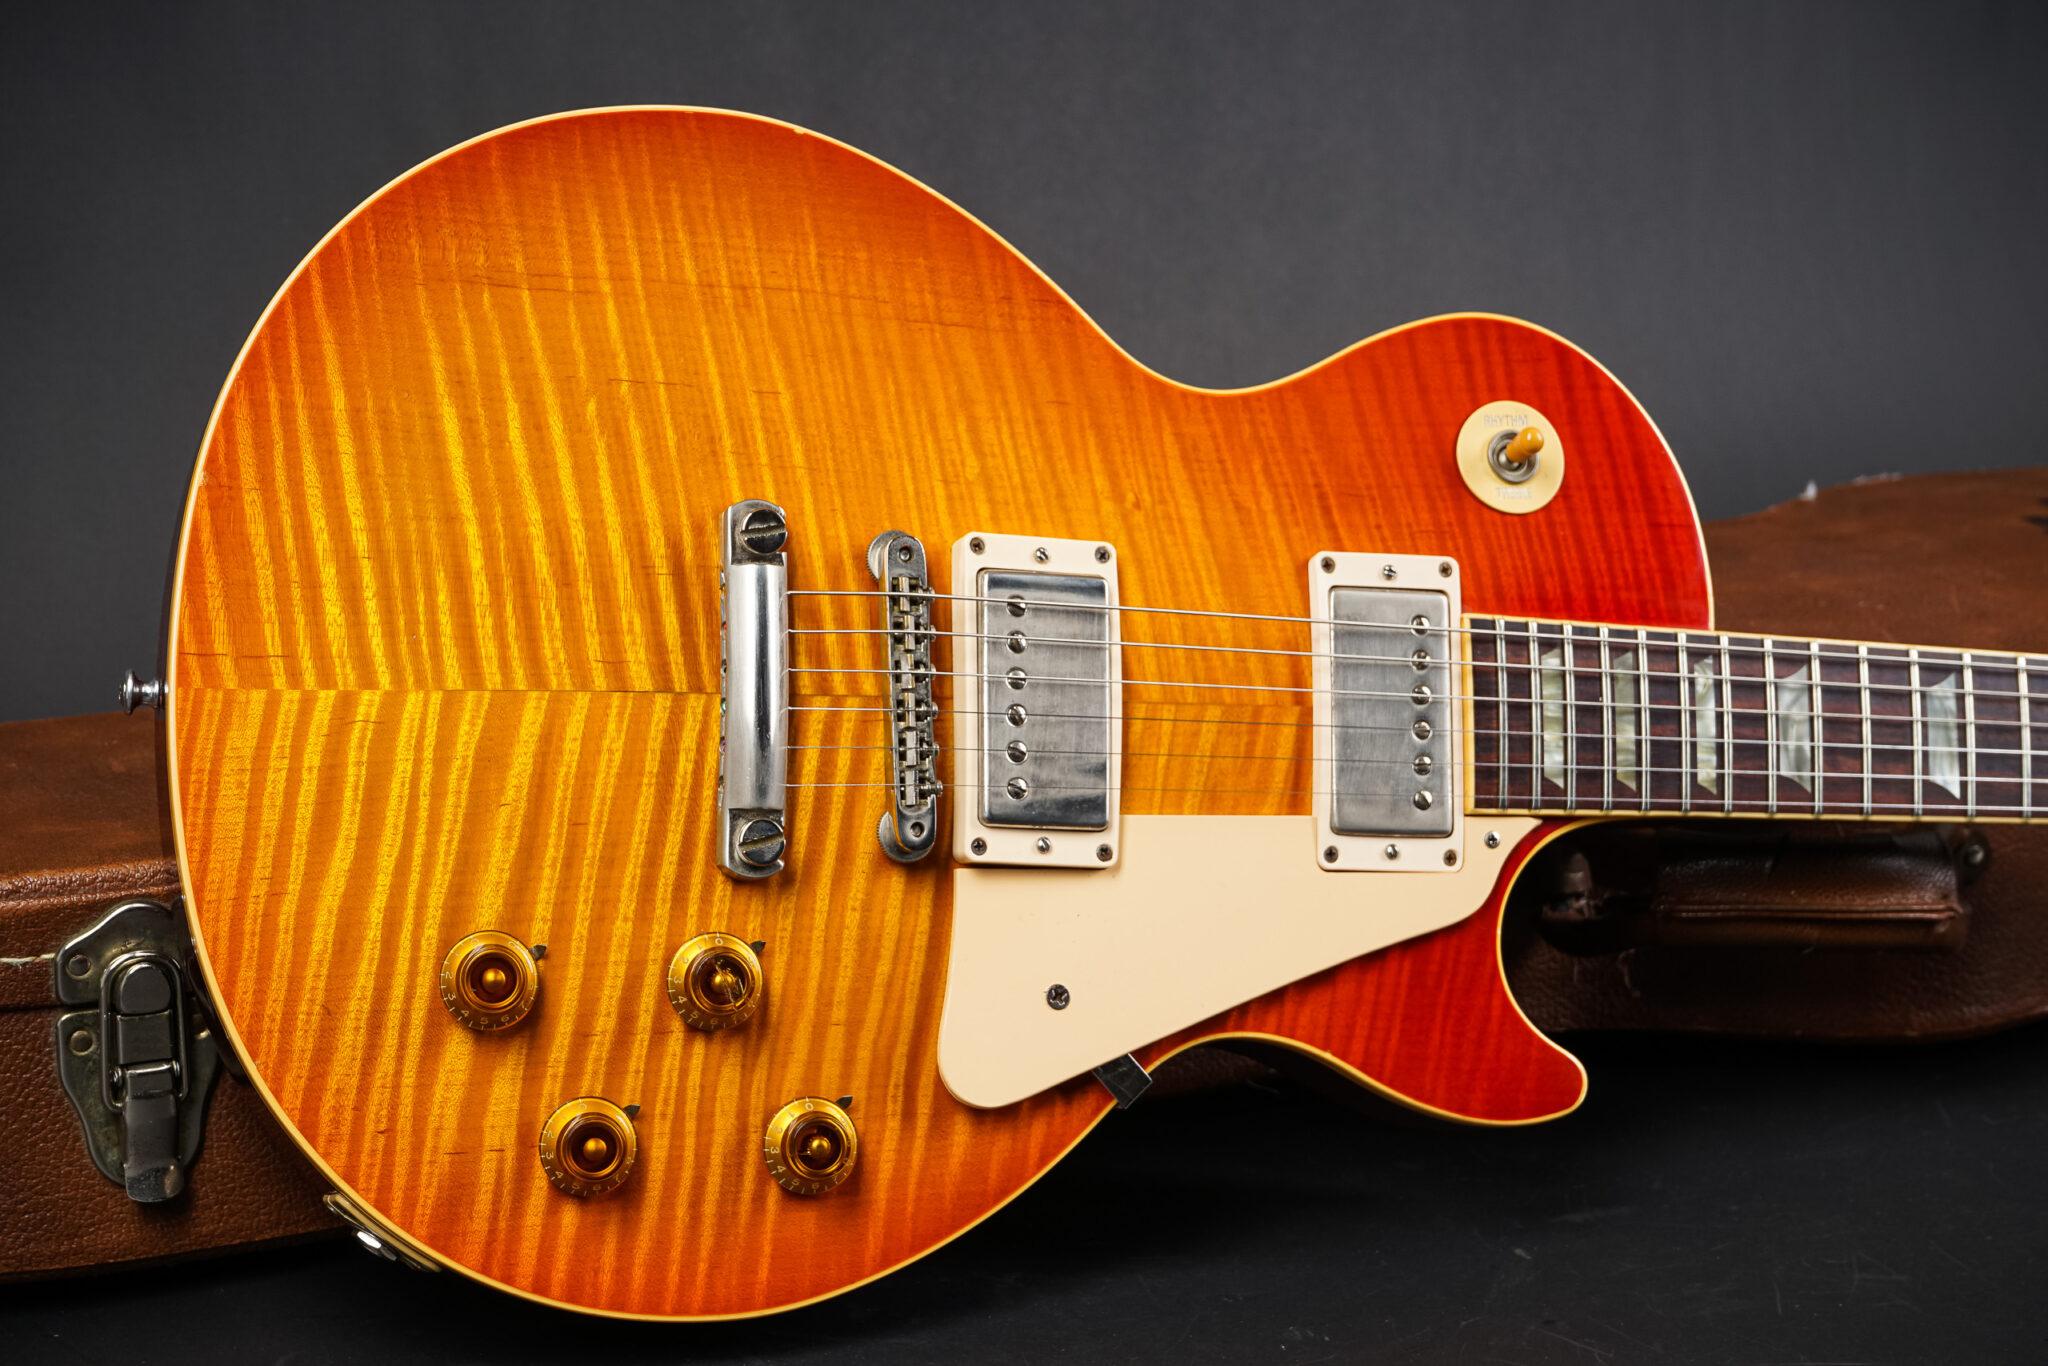 https://guitarpoint.de/app/uploads/products/1992-gibson-les-paul-standard-pre-historic-reissue-killertop/1992-Gibson-Les-Paul-Prehistoric-Reissue-27430-10-2048x1366.jpg